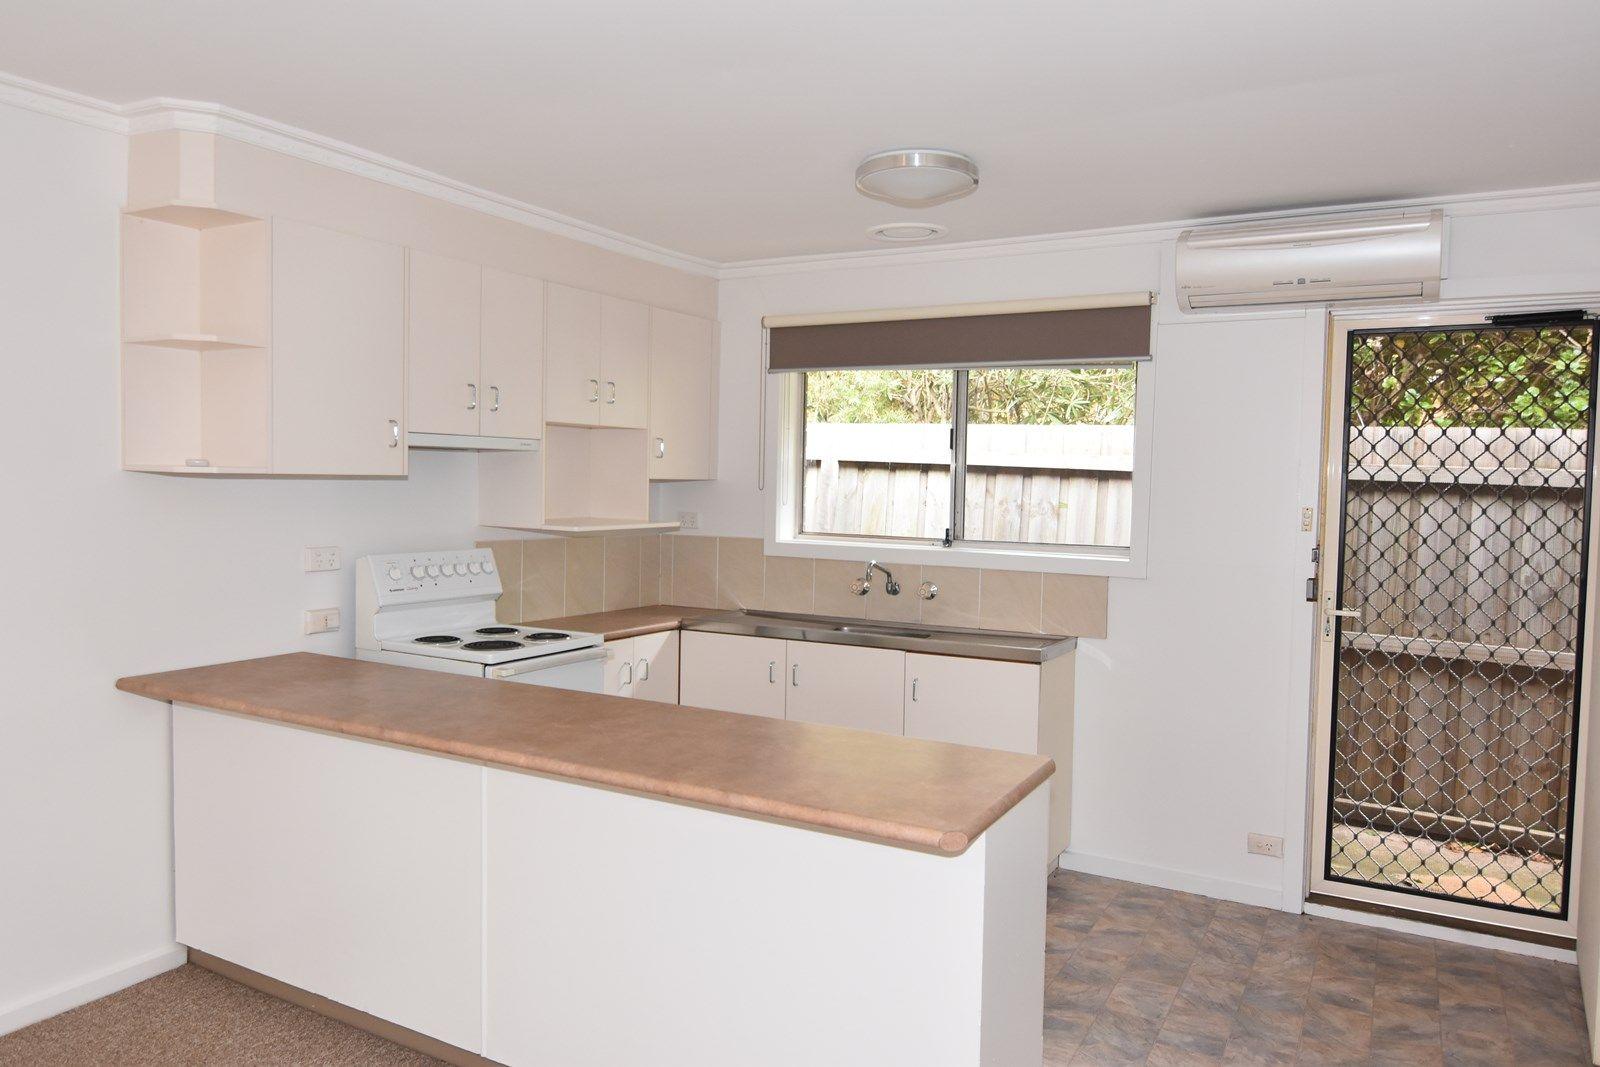 3/48 Clonard Avenue, Geelong West VIC 3218, Image 1